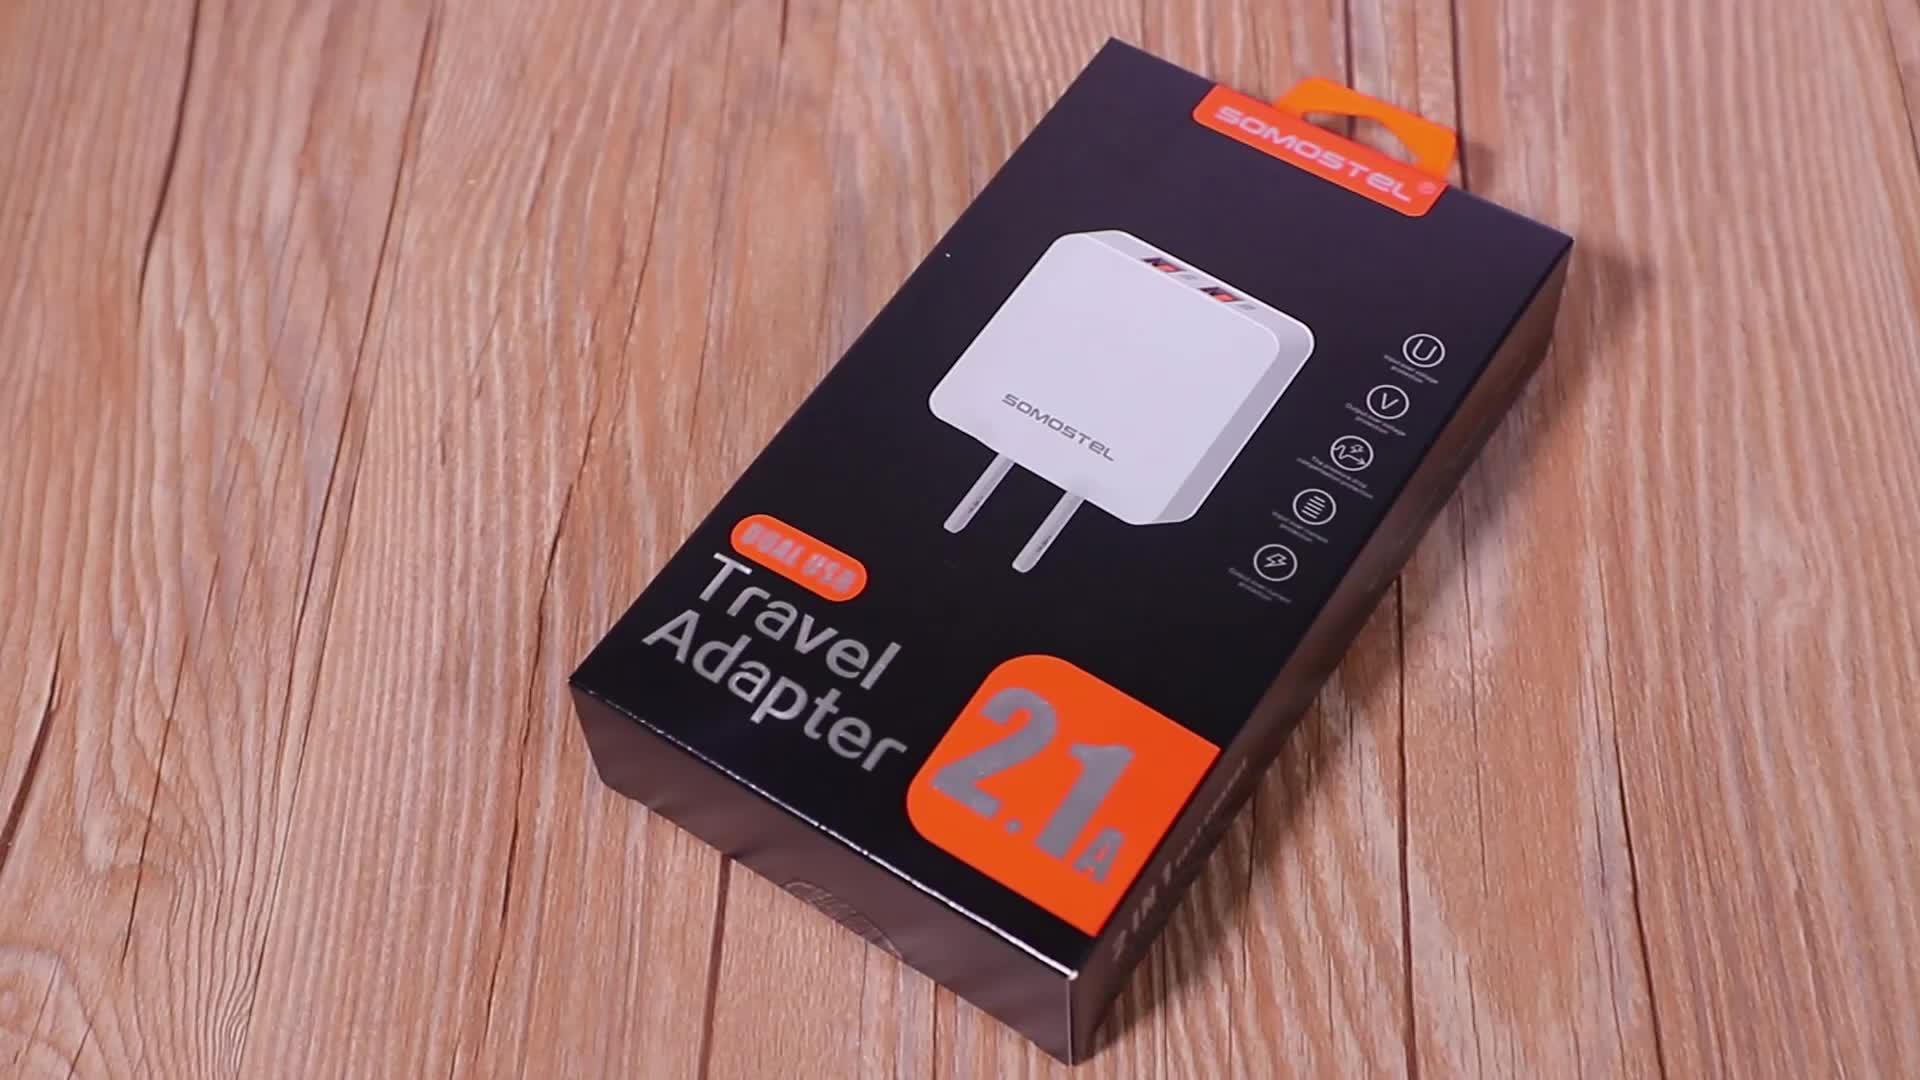 [Somostel] A13 חדש במגמת מוצרי סין מפעל OEM ODM 2 usb מטען cargadores דה celular עבור iphone x xr